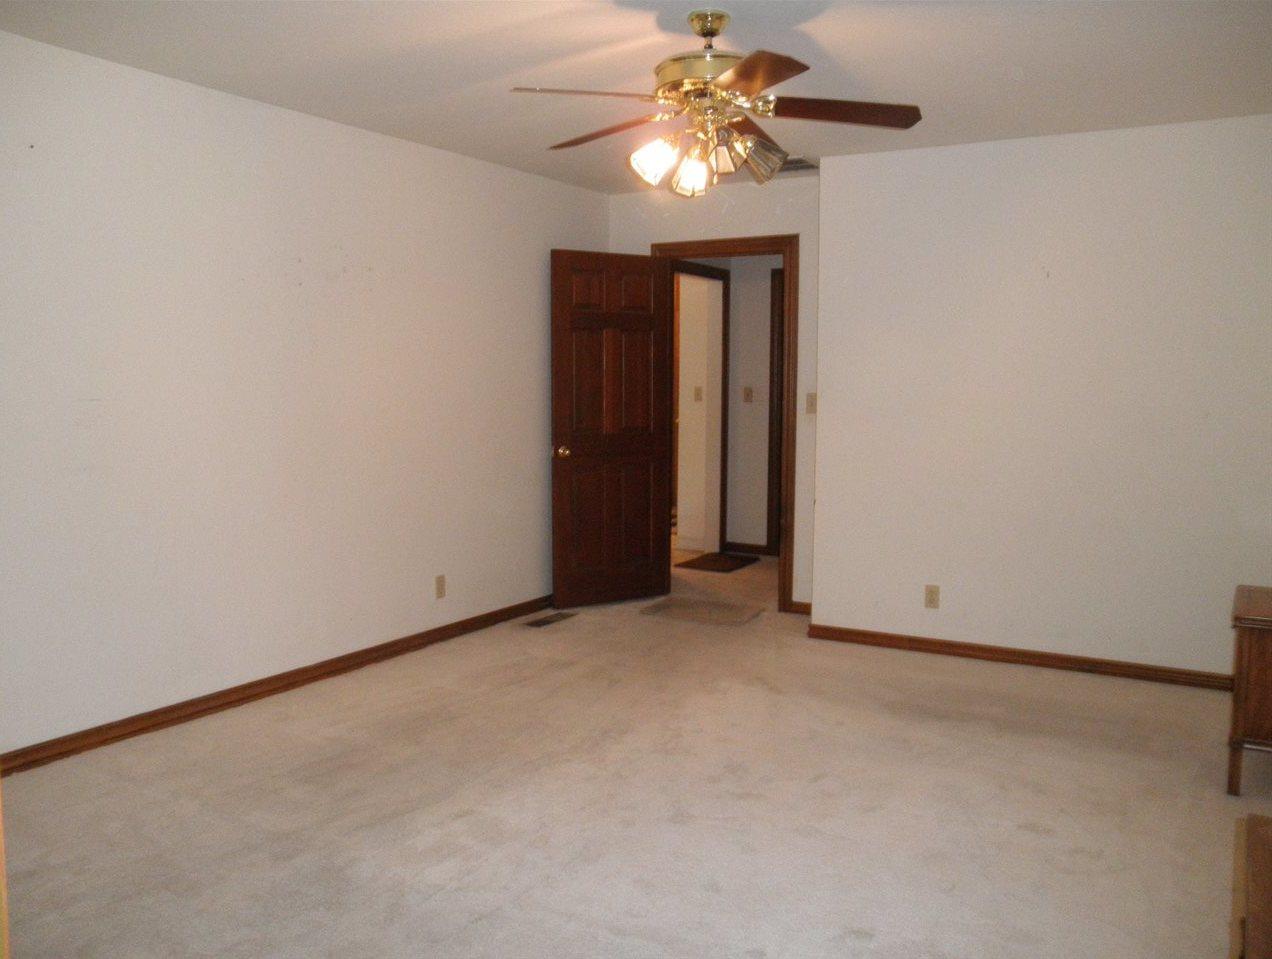 Sold Intraoffice W/MLS | 2 Woodcrest  Ponca City, OK 74604 18